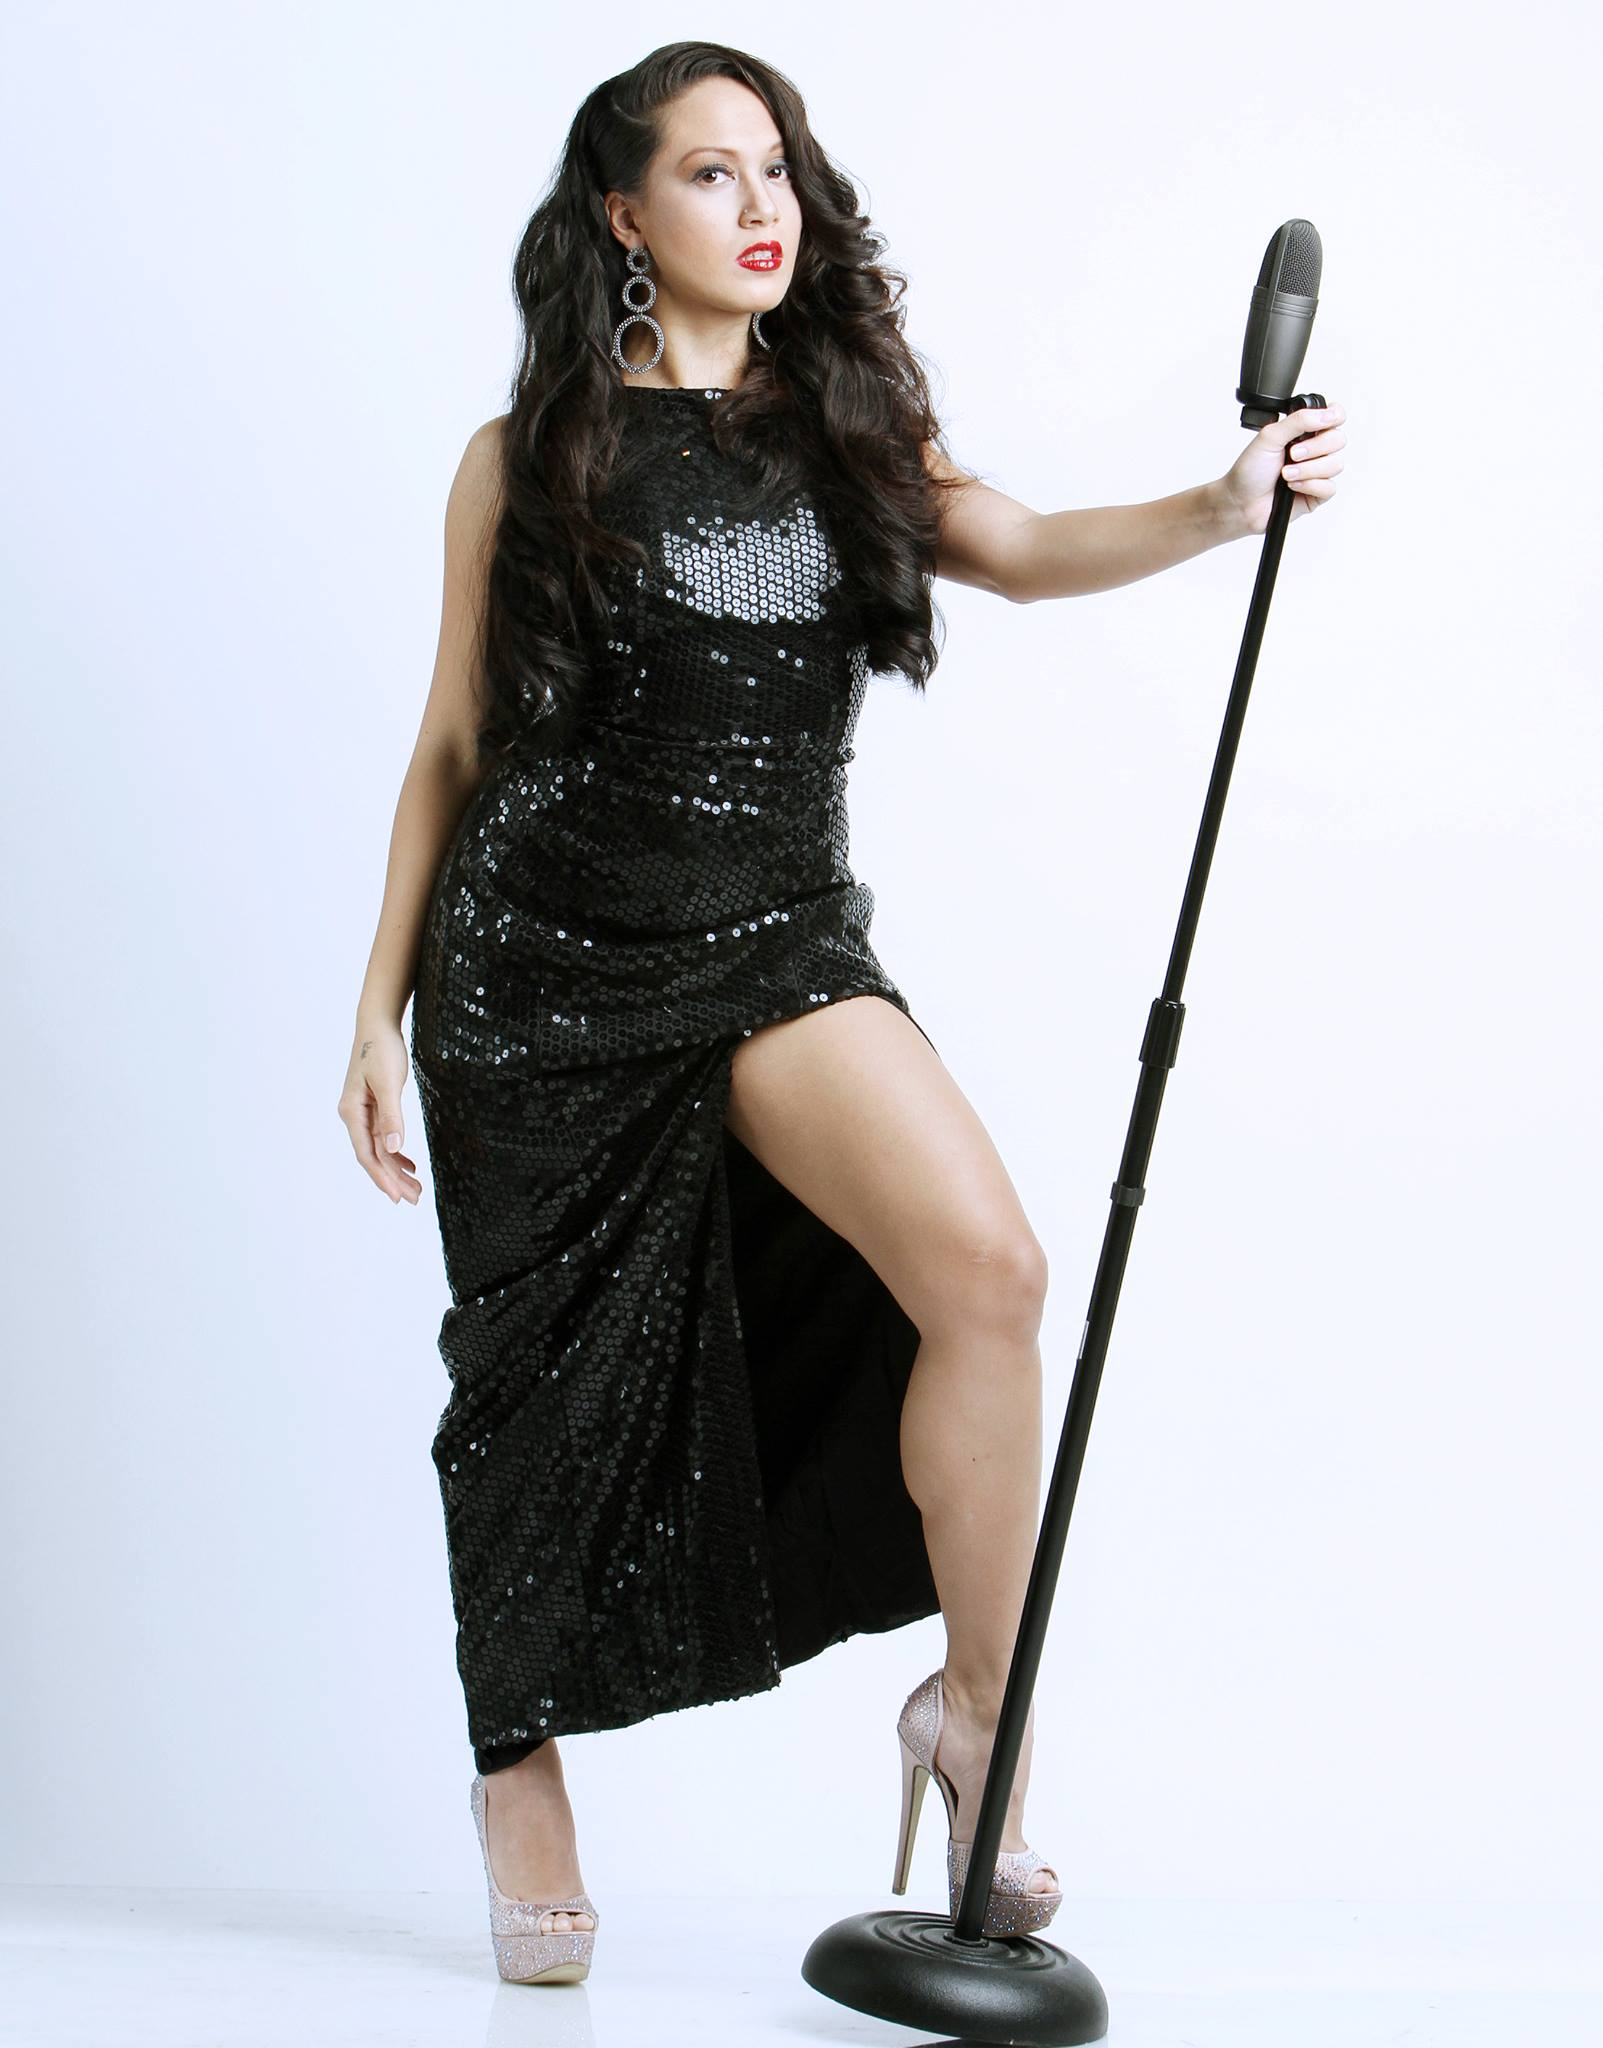 Hilayna Starr -